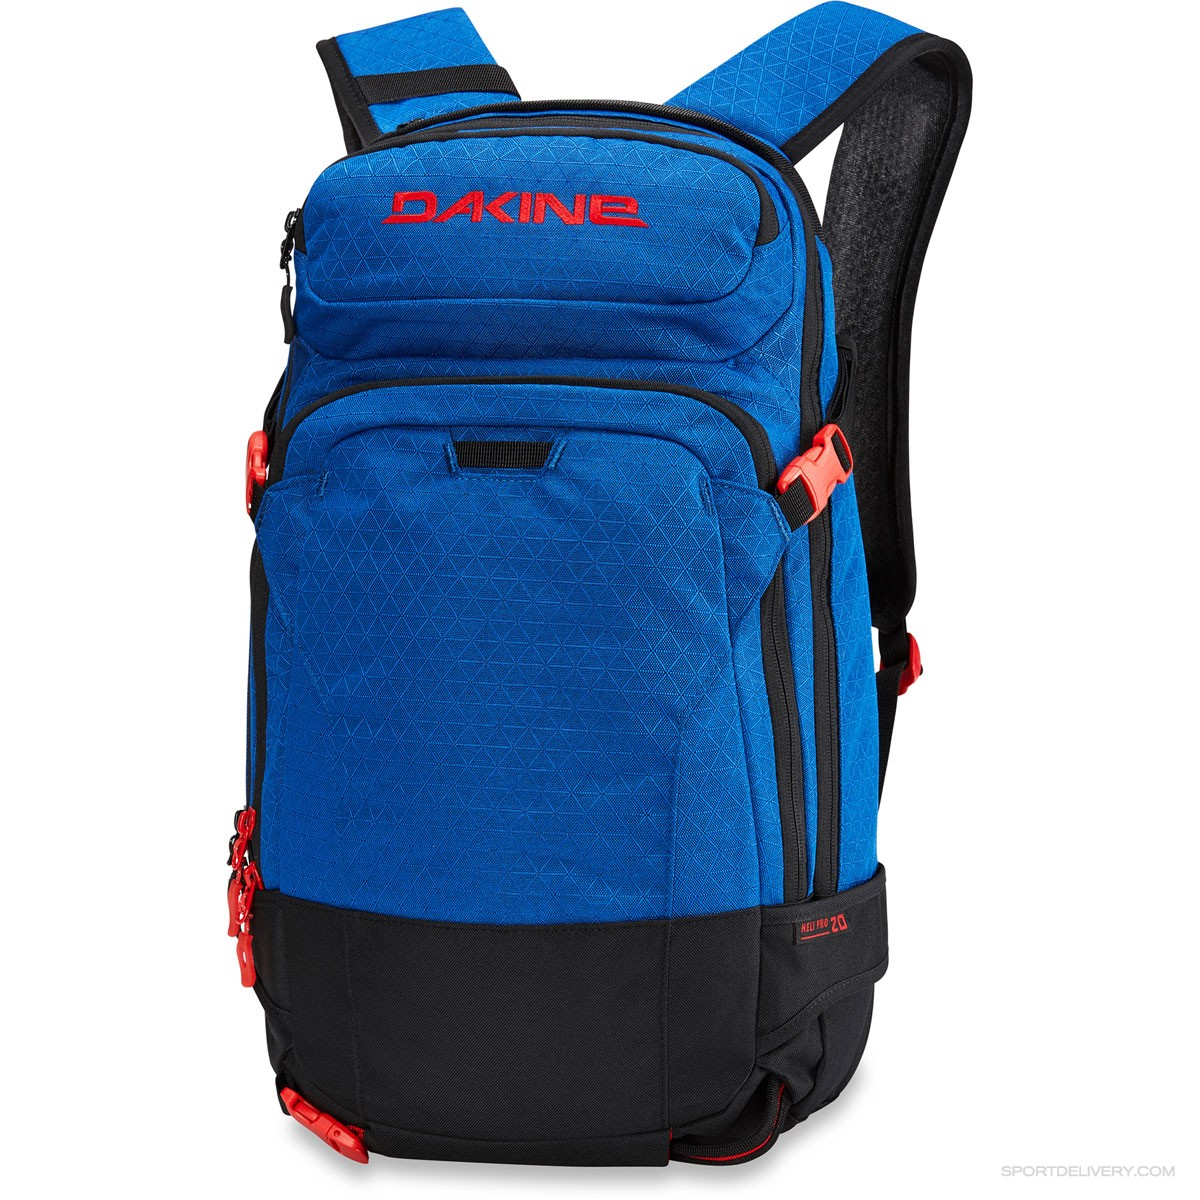 c9bebf786a7b1 dakine backpack Heli Pro 20l - back packs - Sport Delivery shop